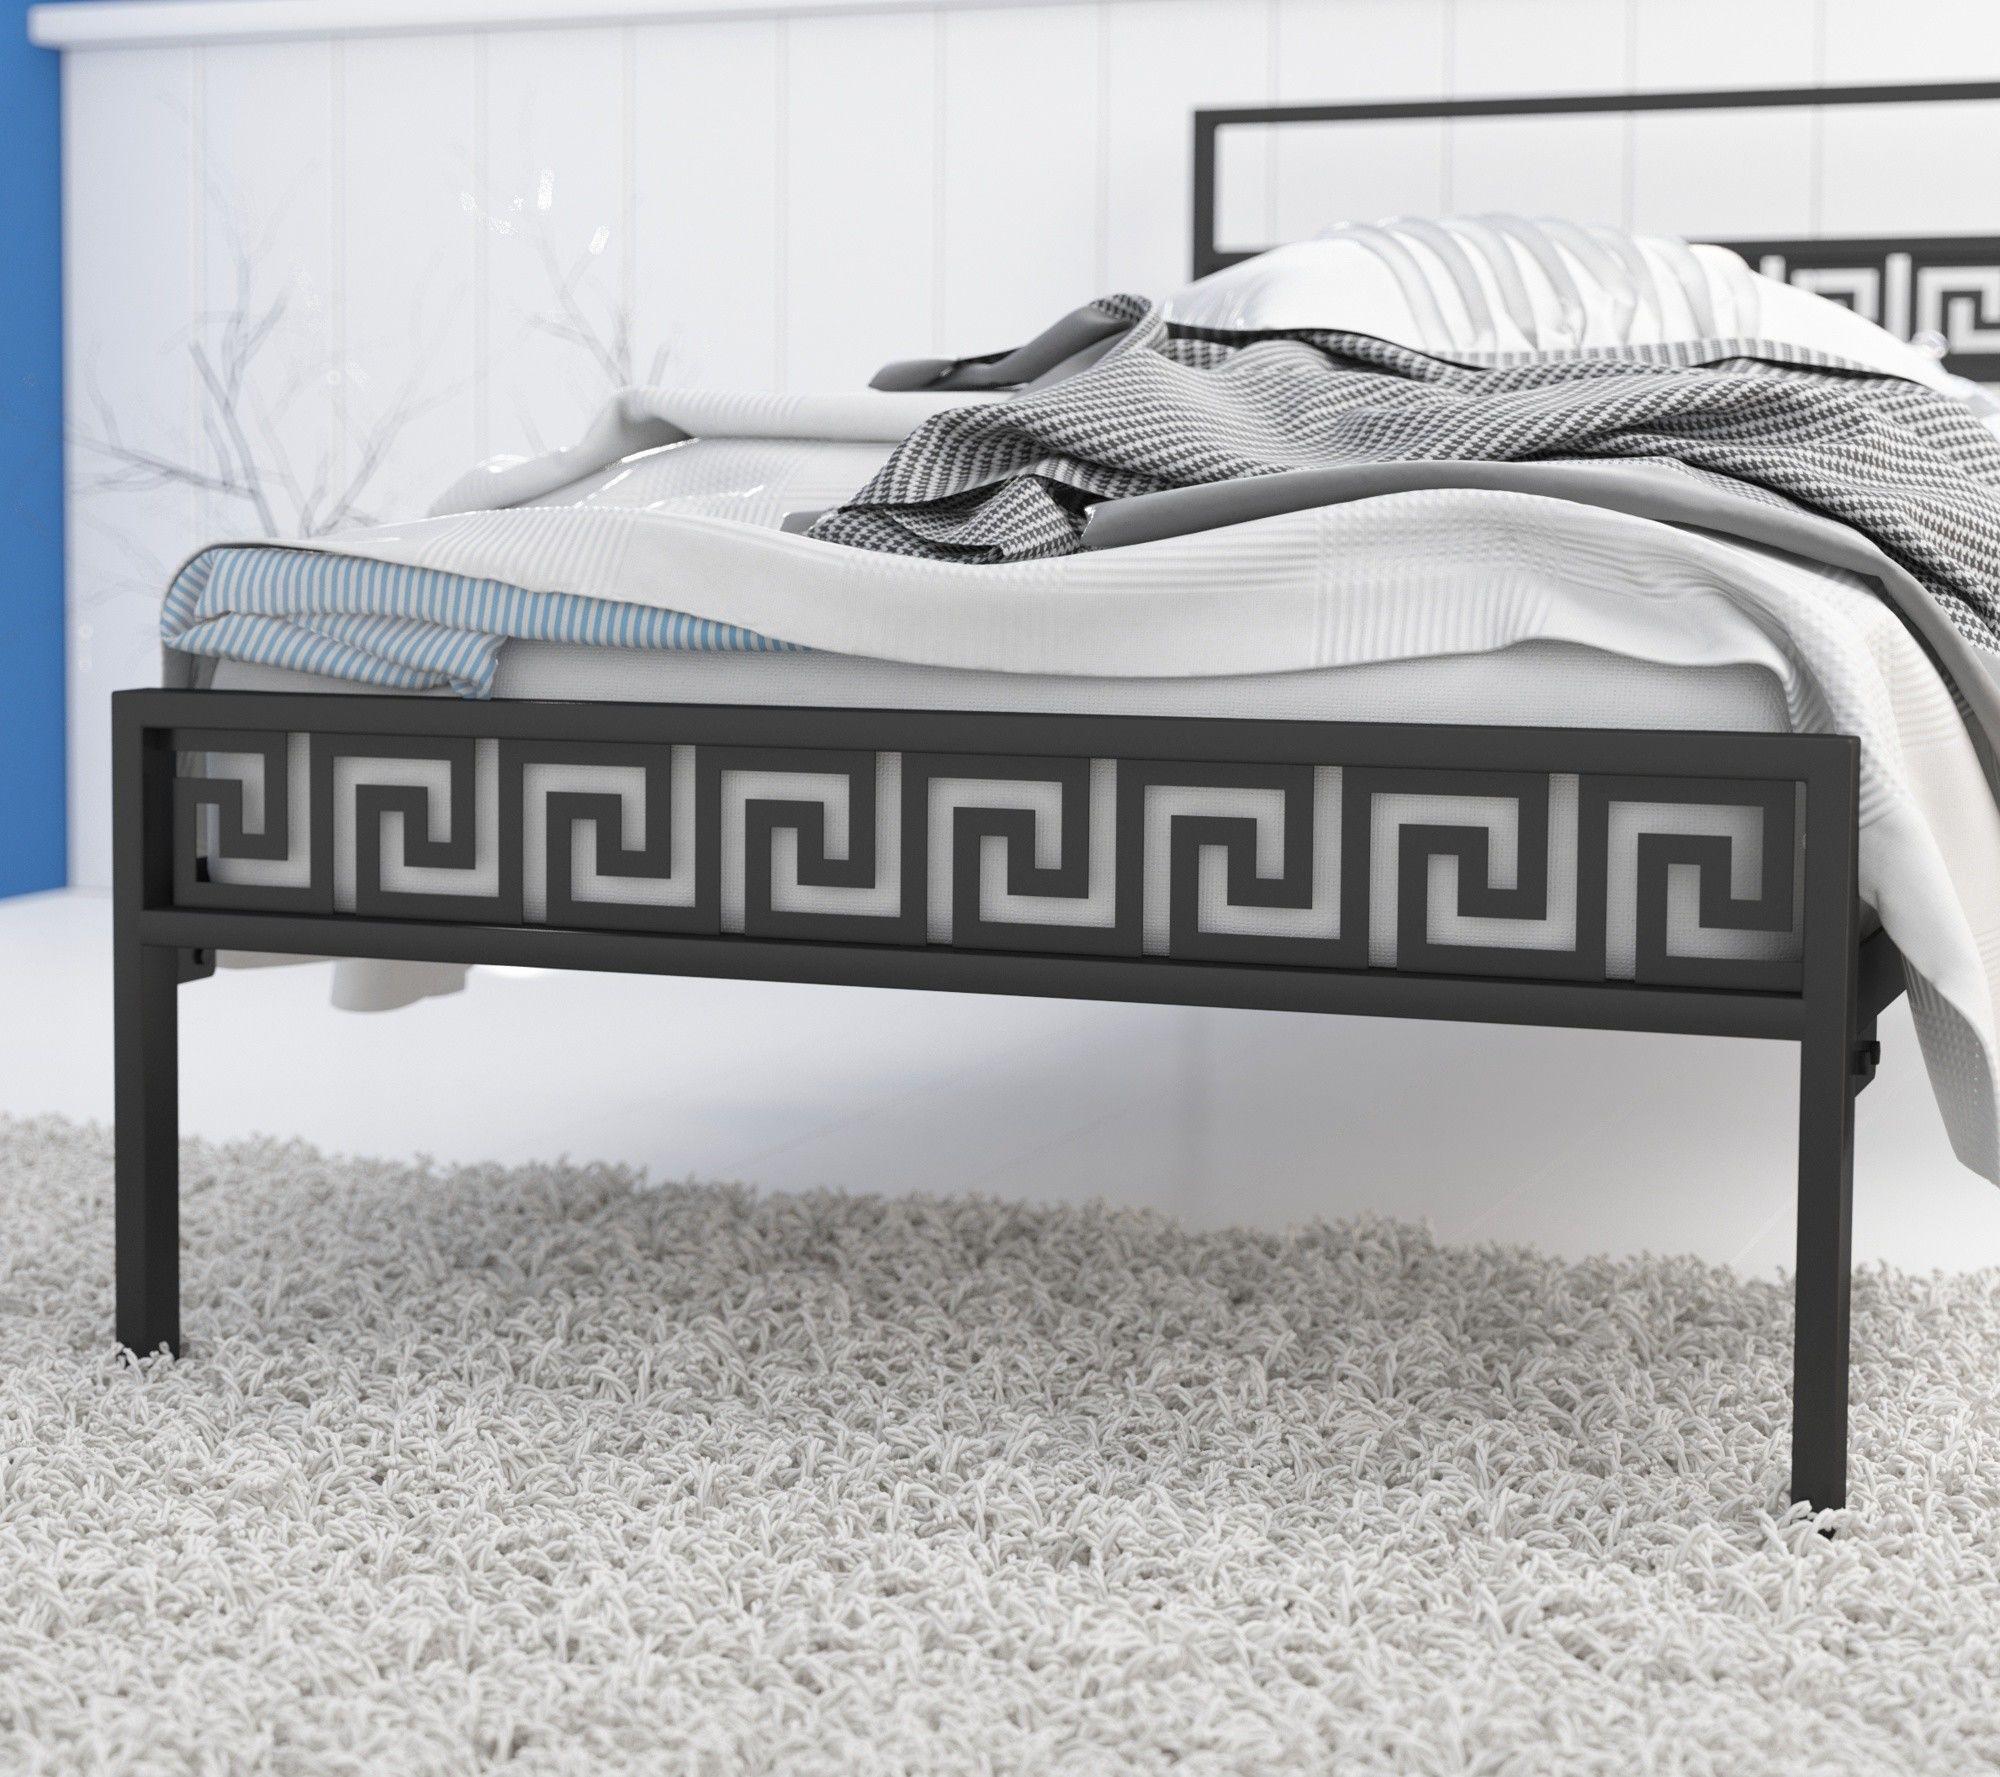 Łóżko metalowe 80x200 wzór 9 ze stelażem